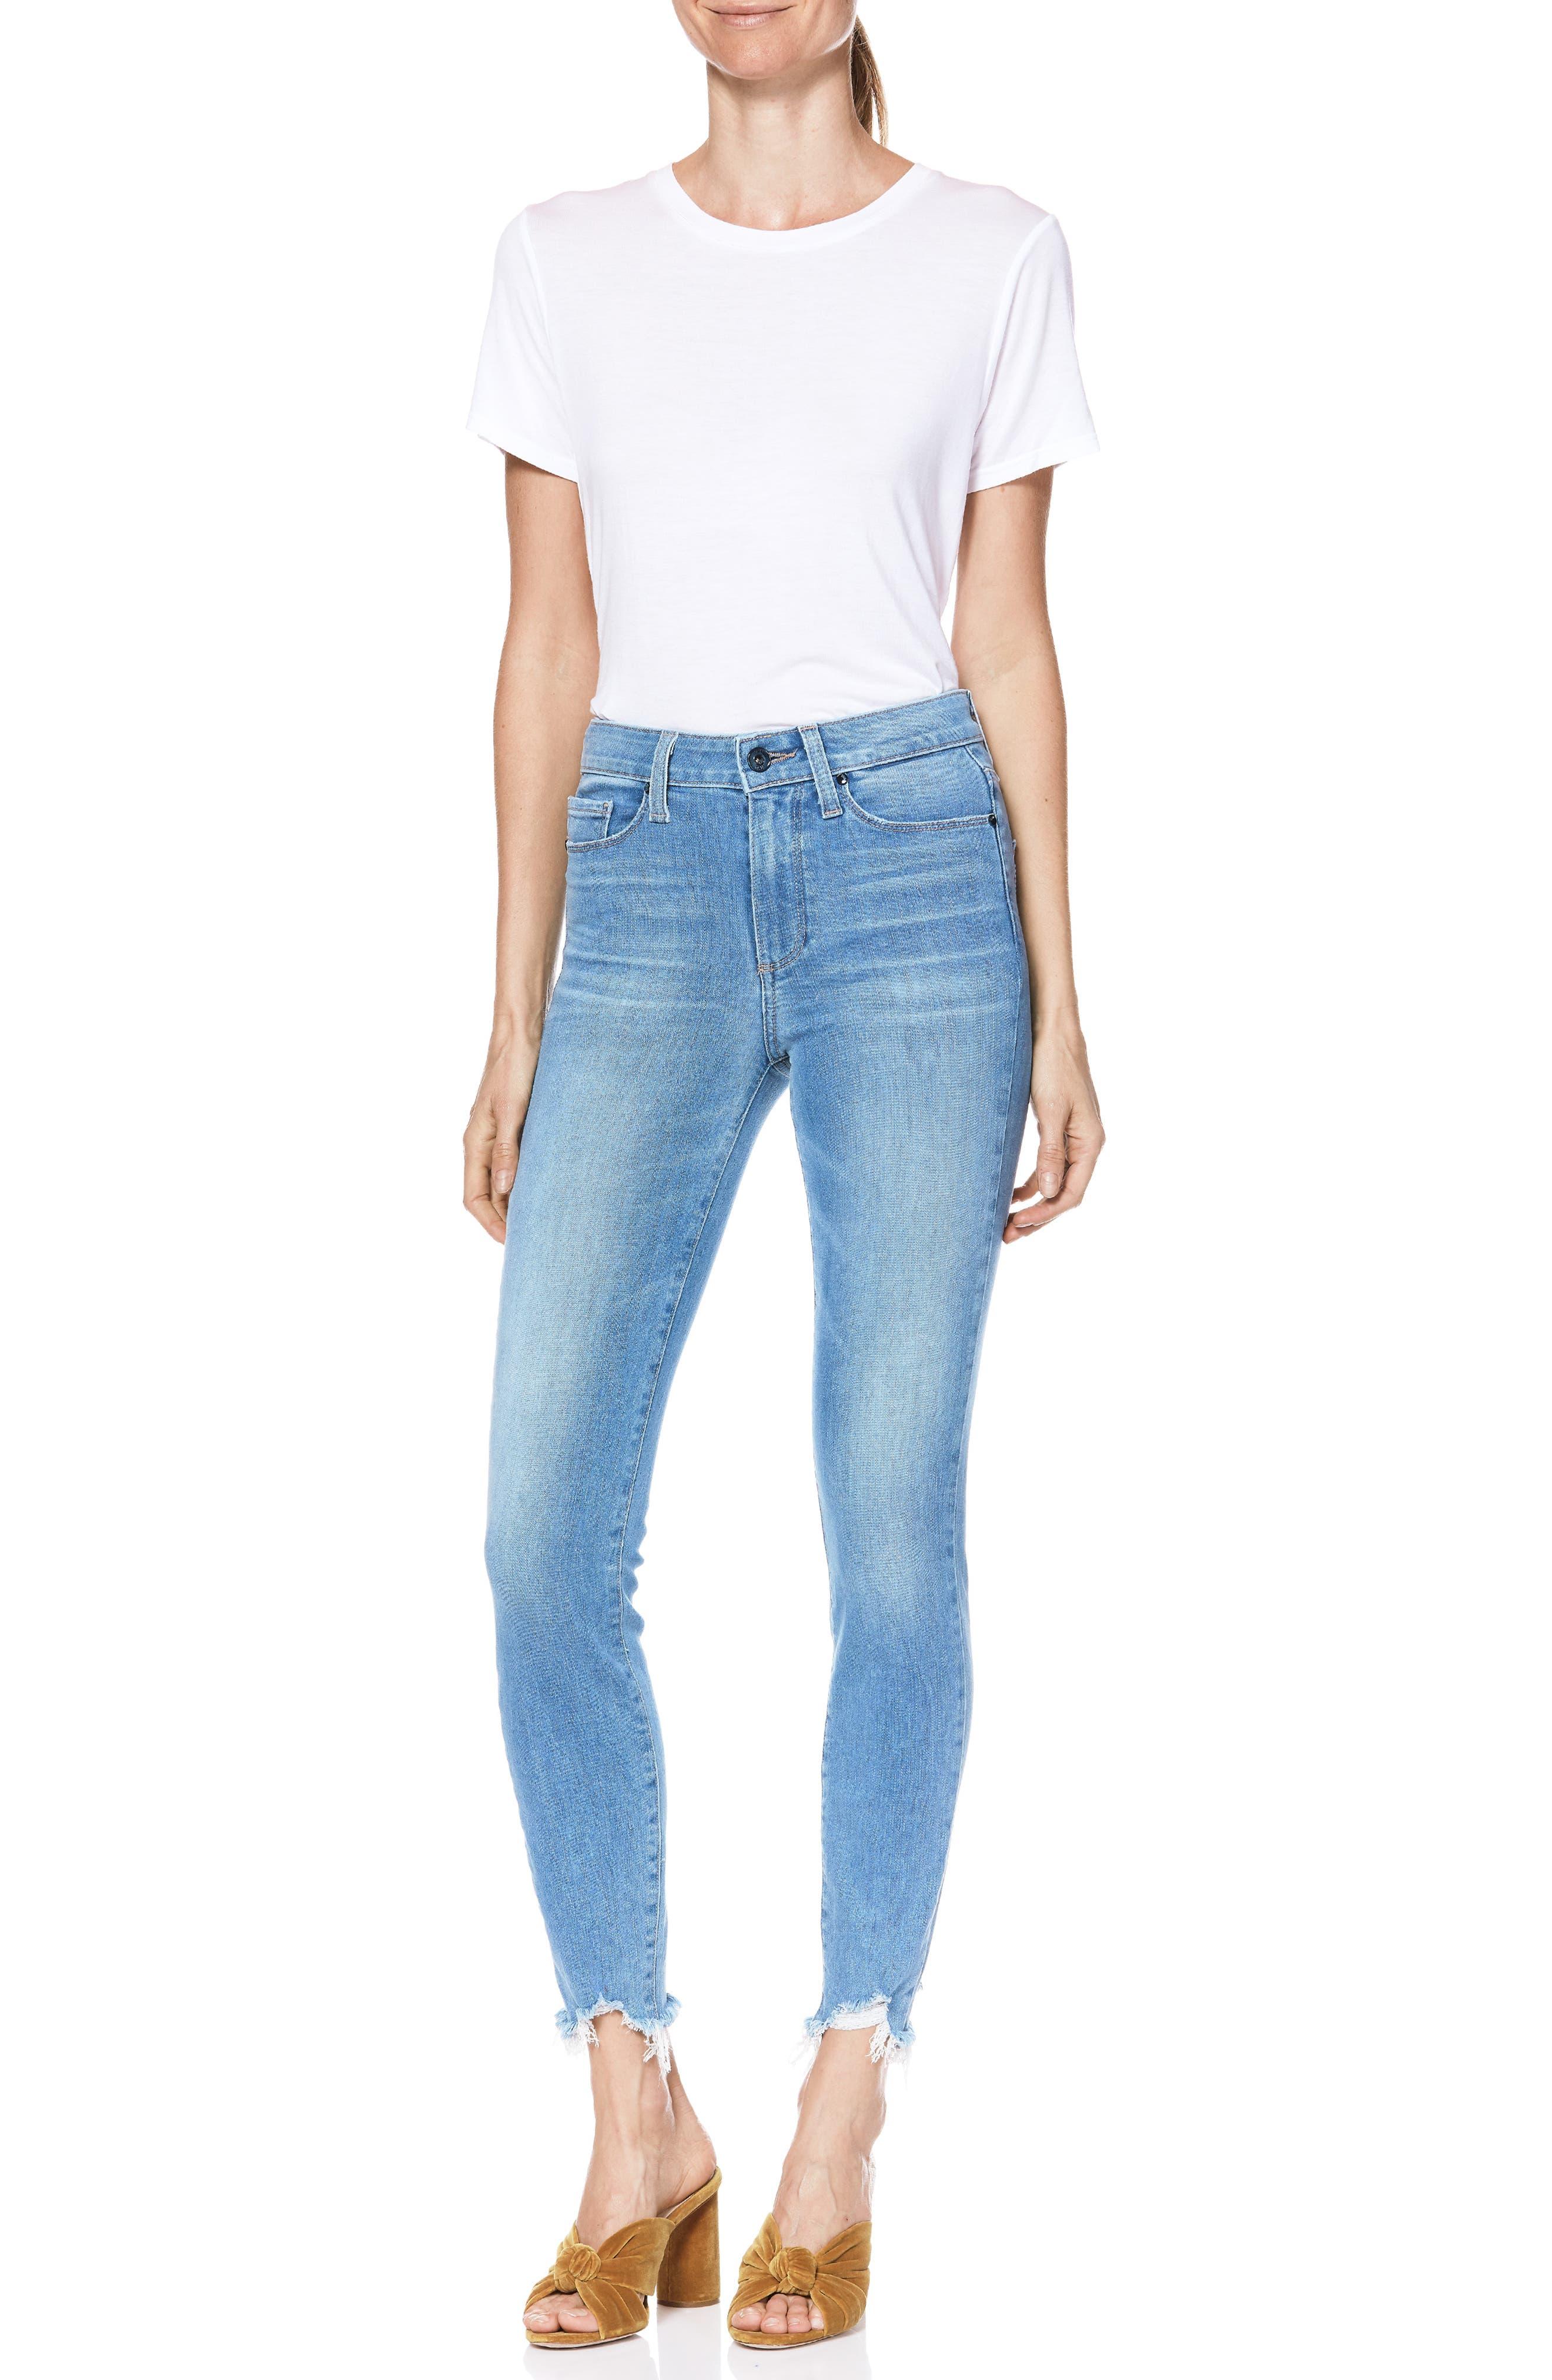 Transcend Vintage - Hoxton High Waist Ripped Crop Skinny Jeans,                             Alternate thumbnail 5, color,                             ALAMEDA